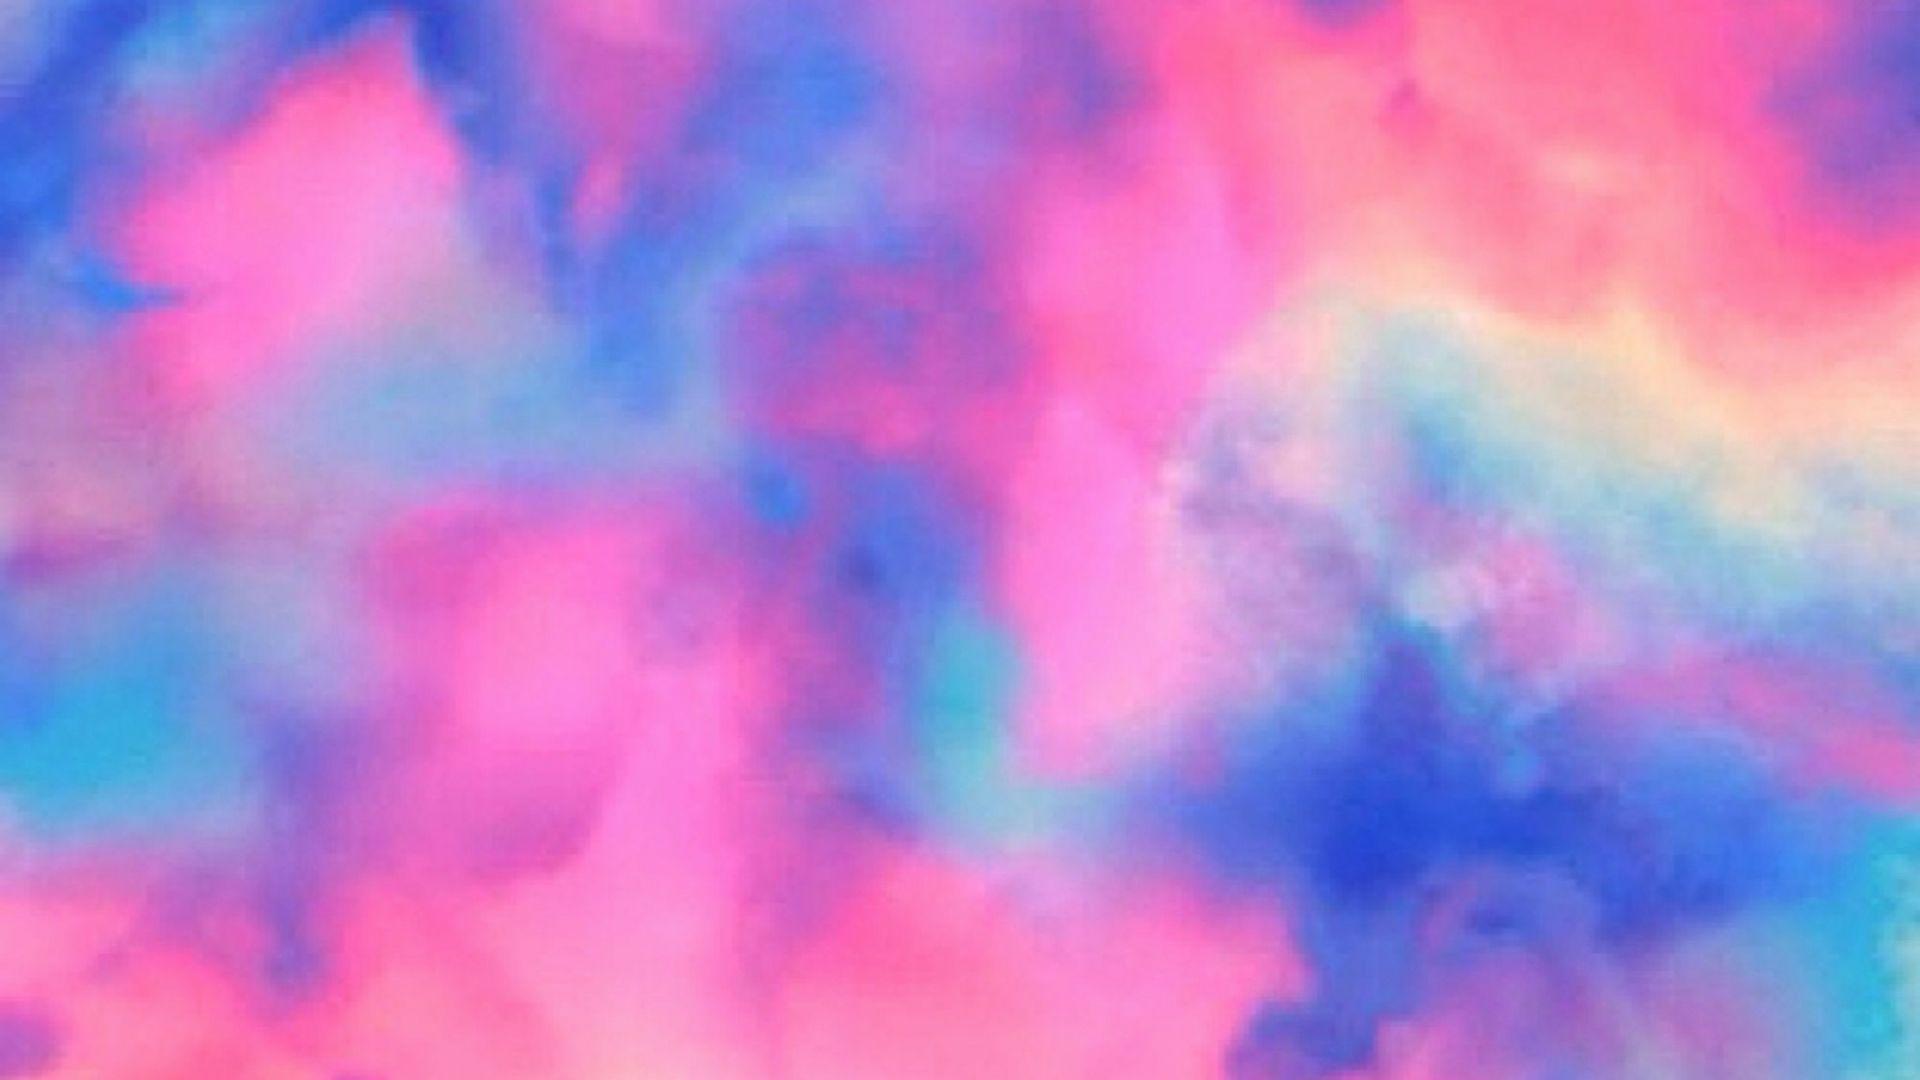 Pastel Tie Dye Wallpapers - Top Free Pastel Tie Dye ...